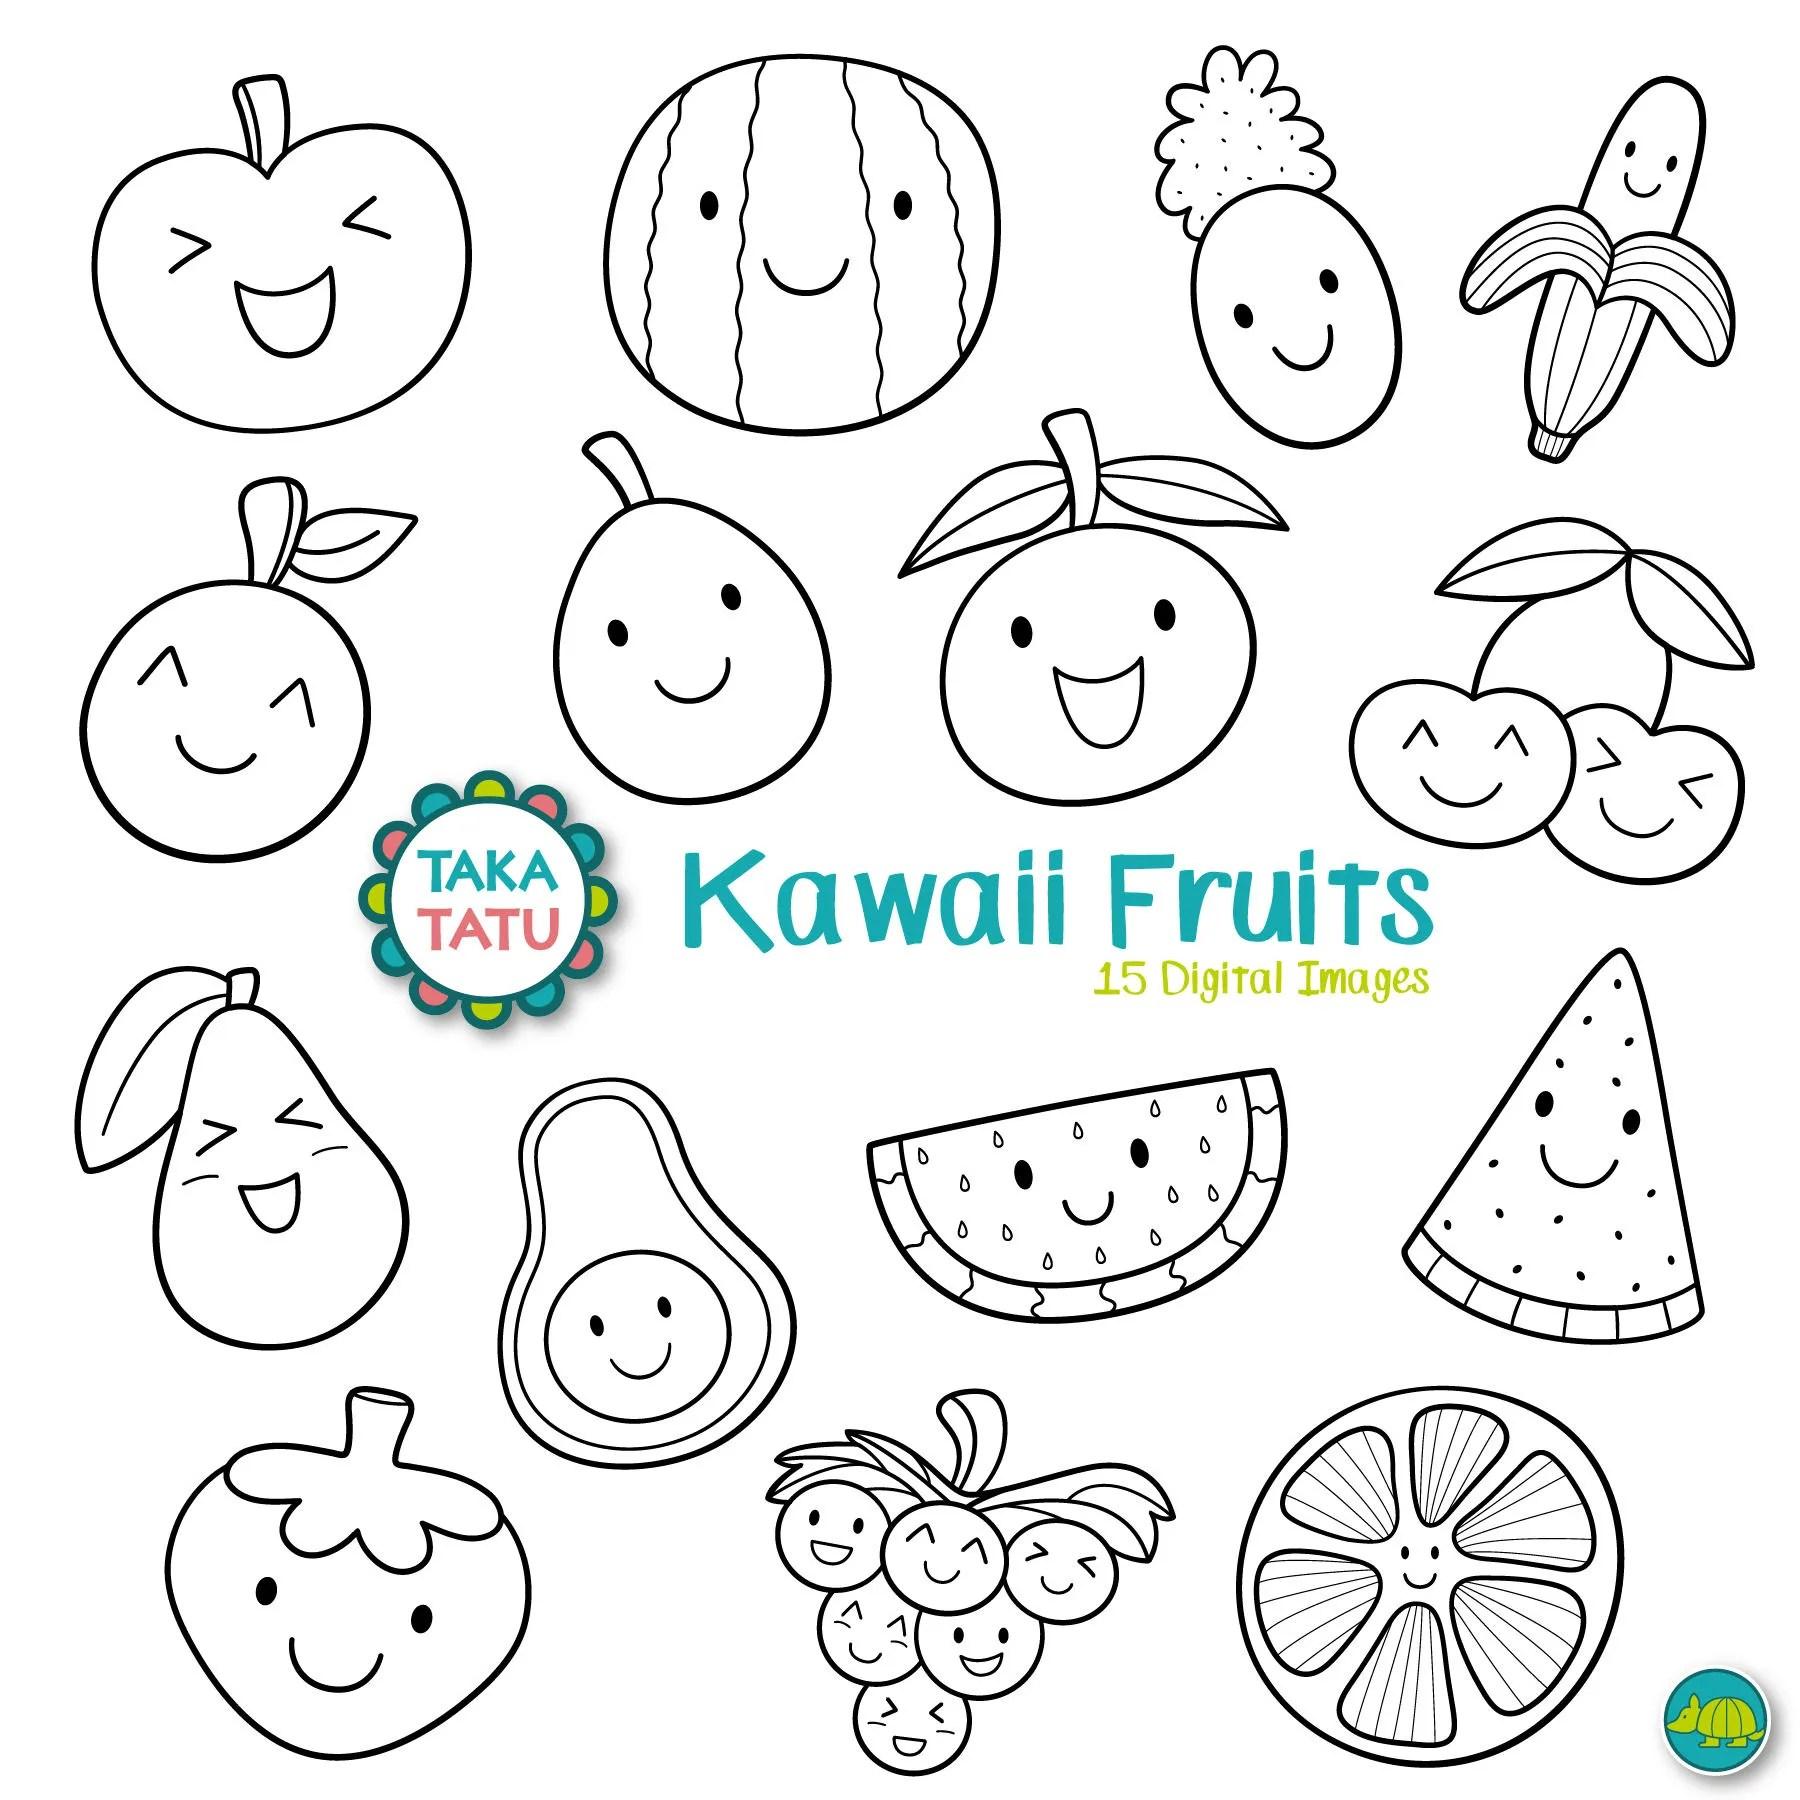 Kawaii Fruits Digital Stamp Black And White Clipart